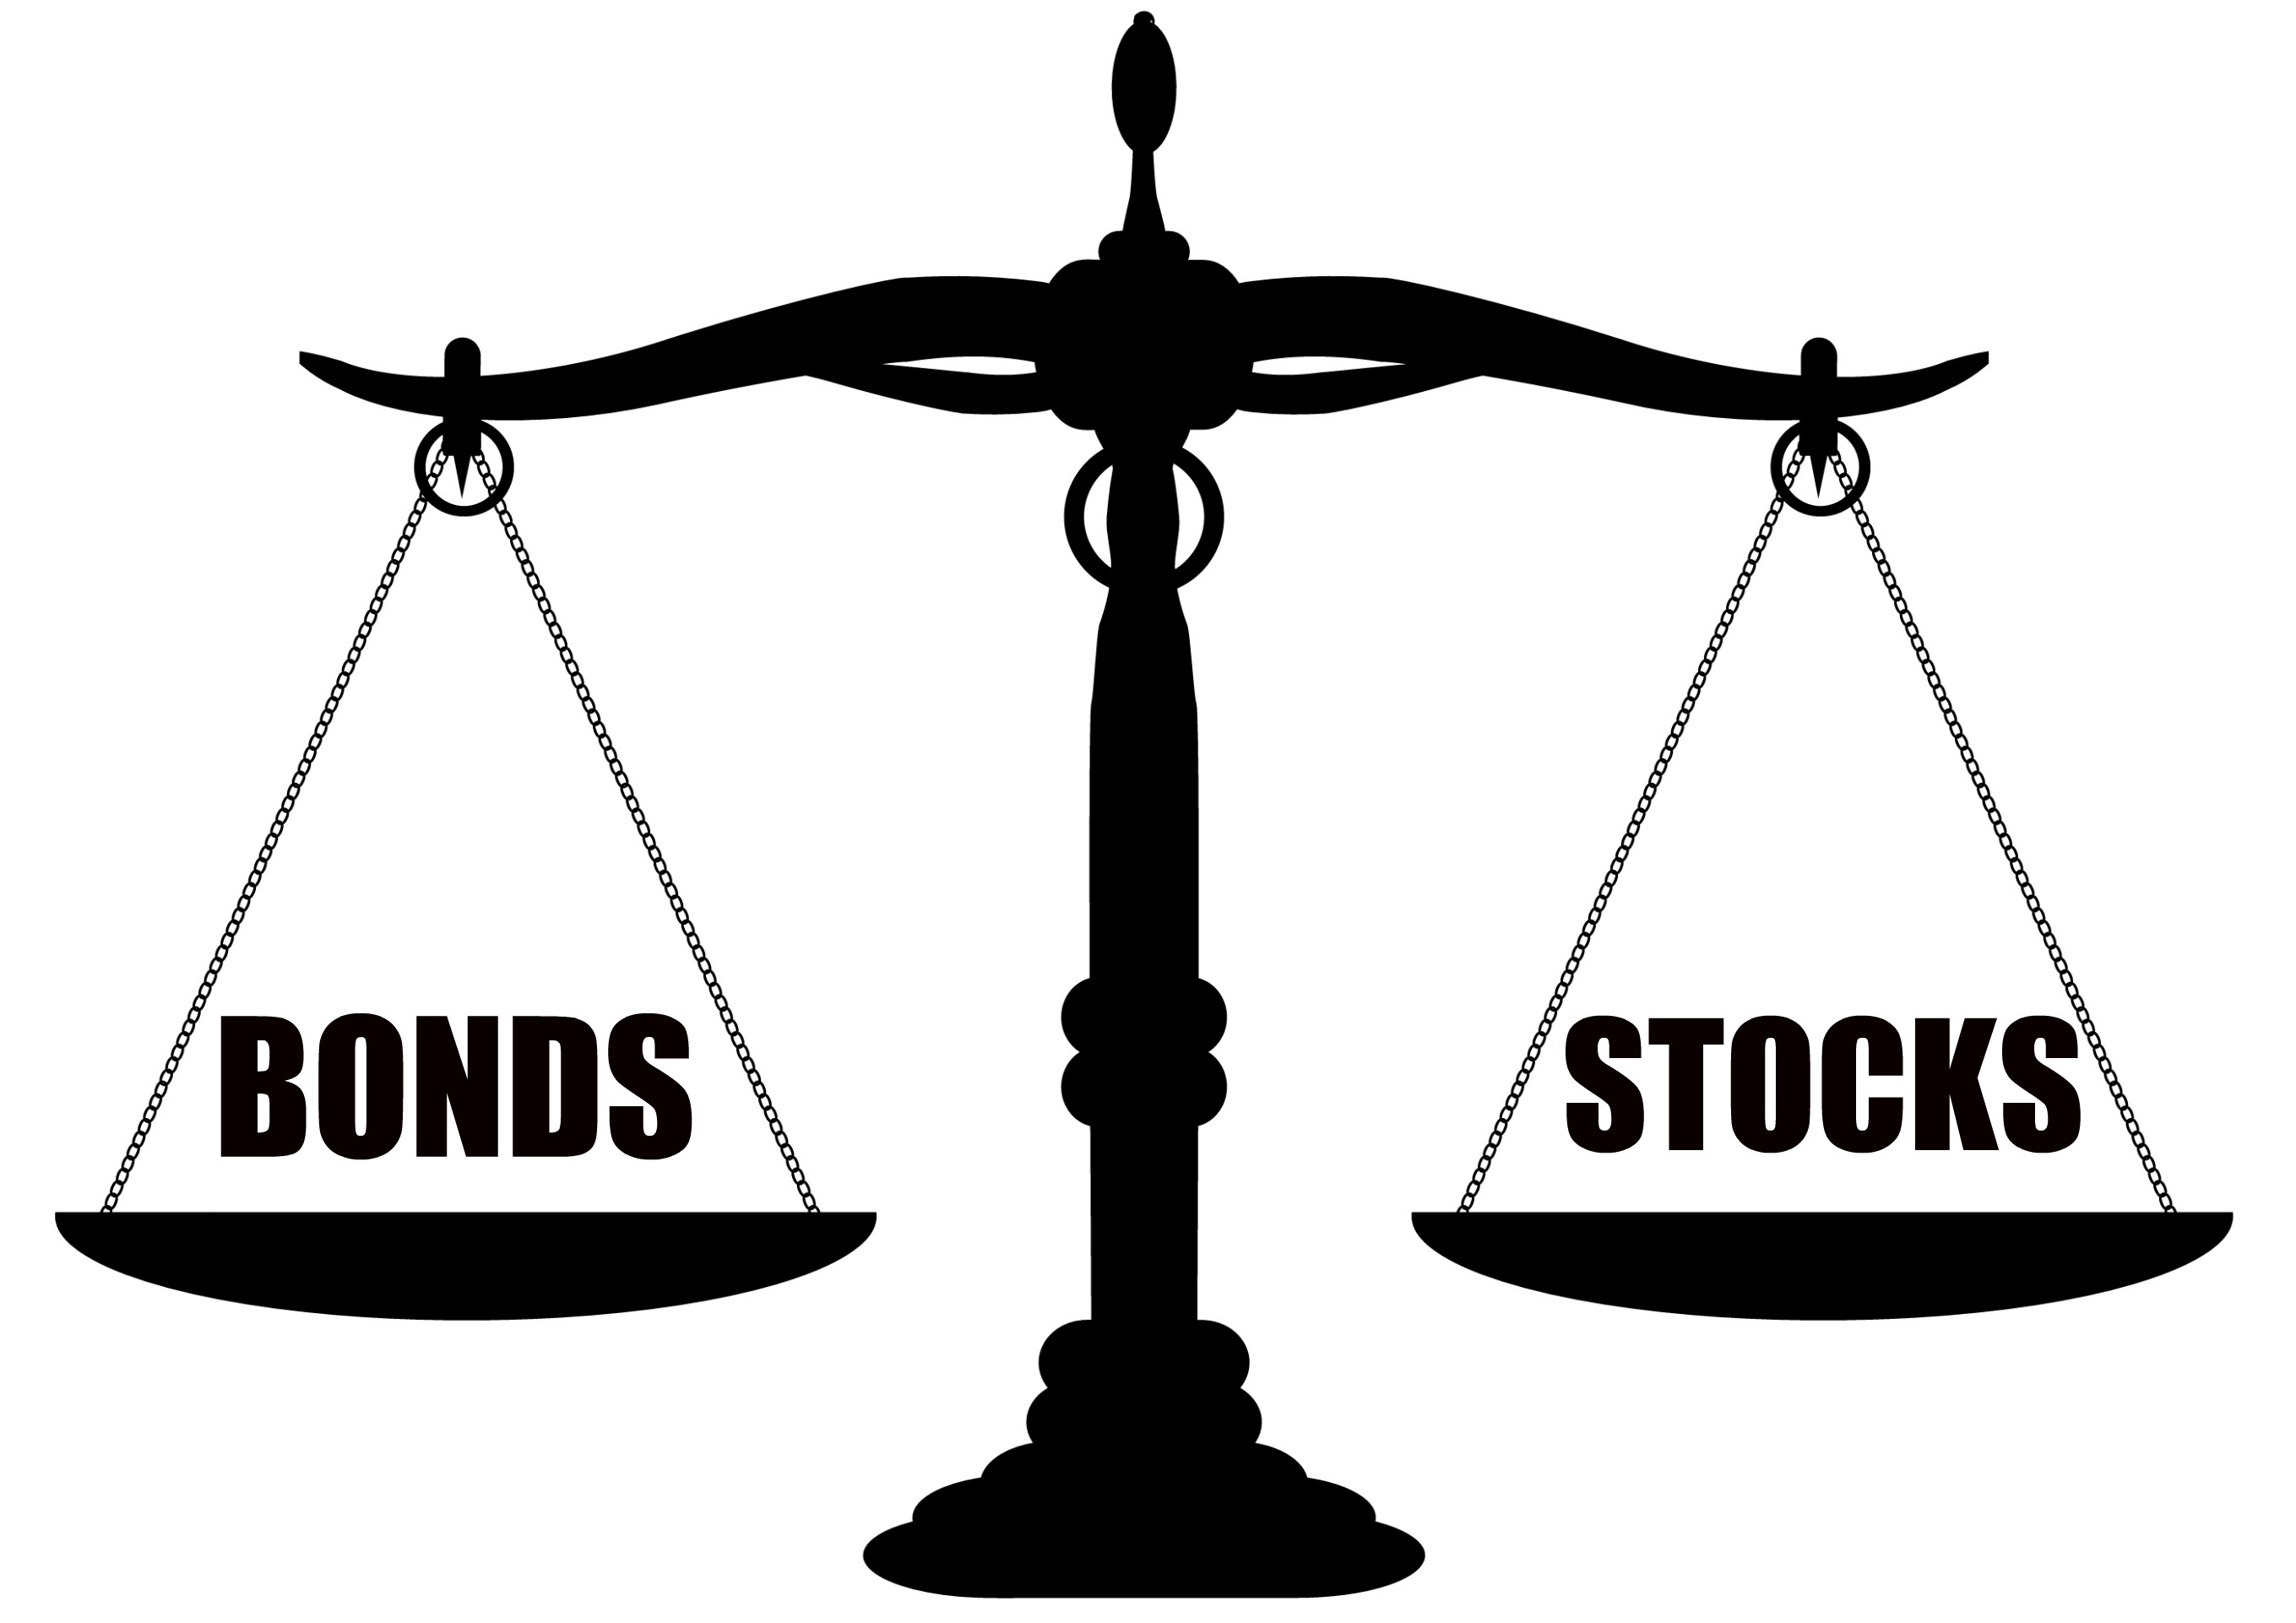 Should I Invest In Bonds